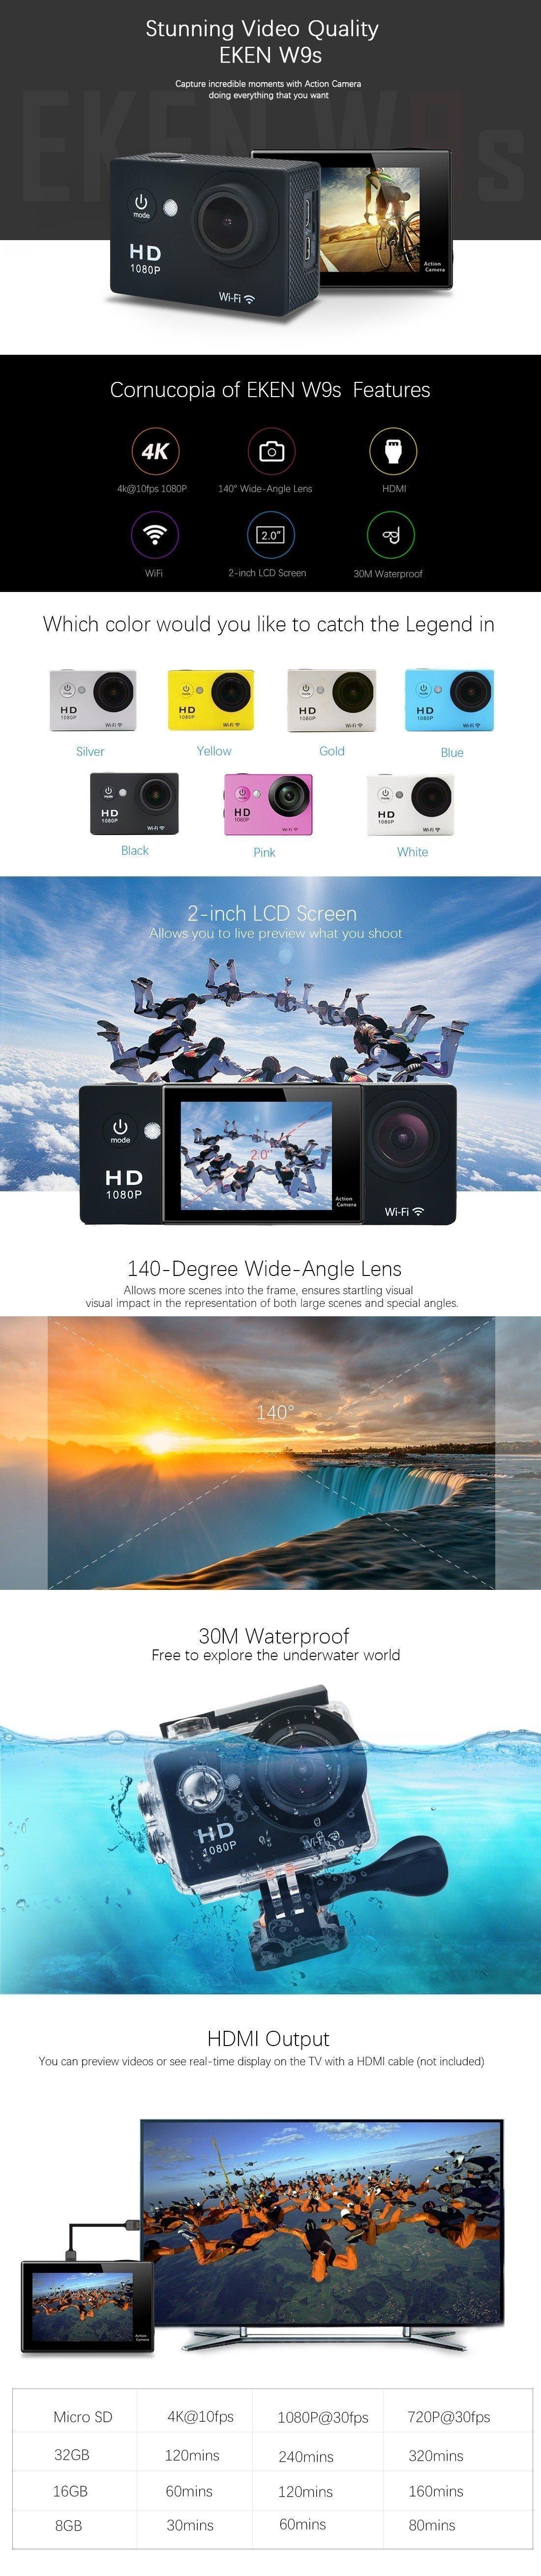 Eken W9s Sport Action Camera